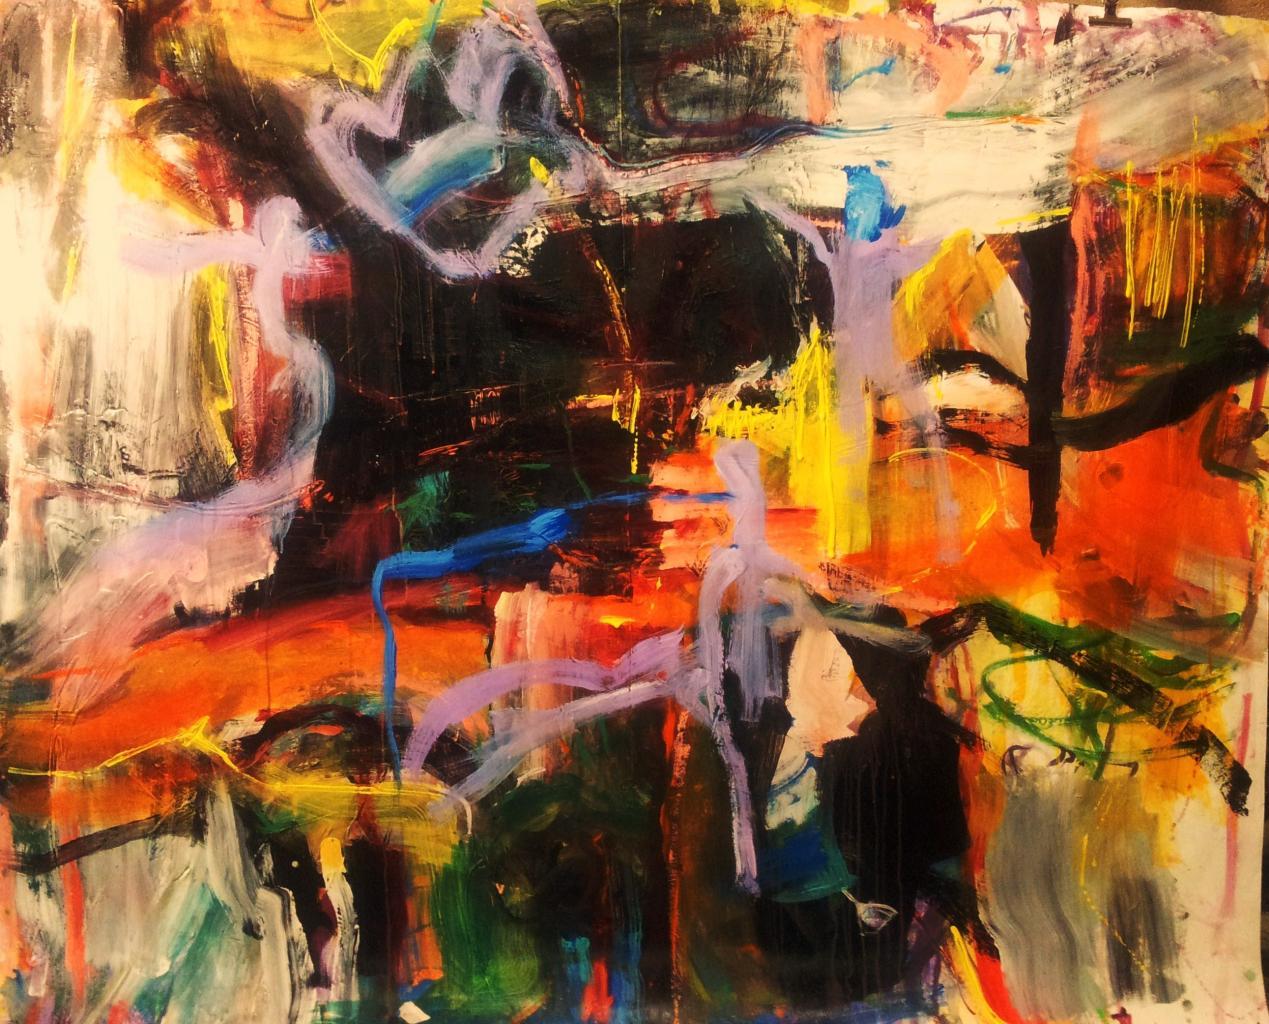 la traversée orange - 200x150 - (2012)